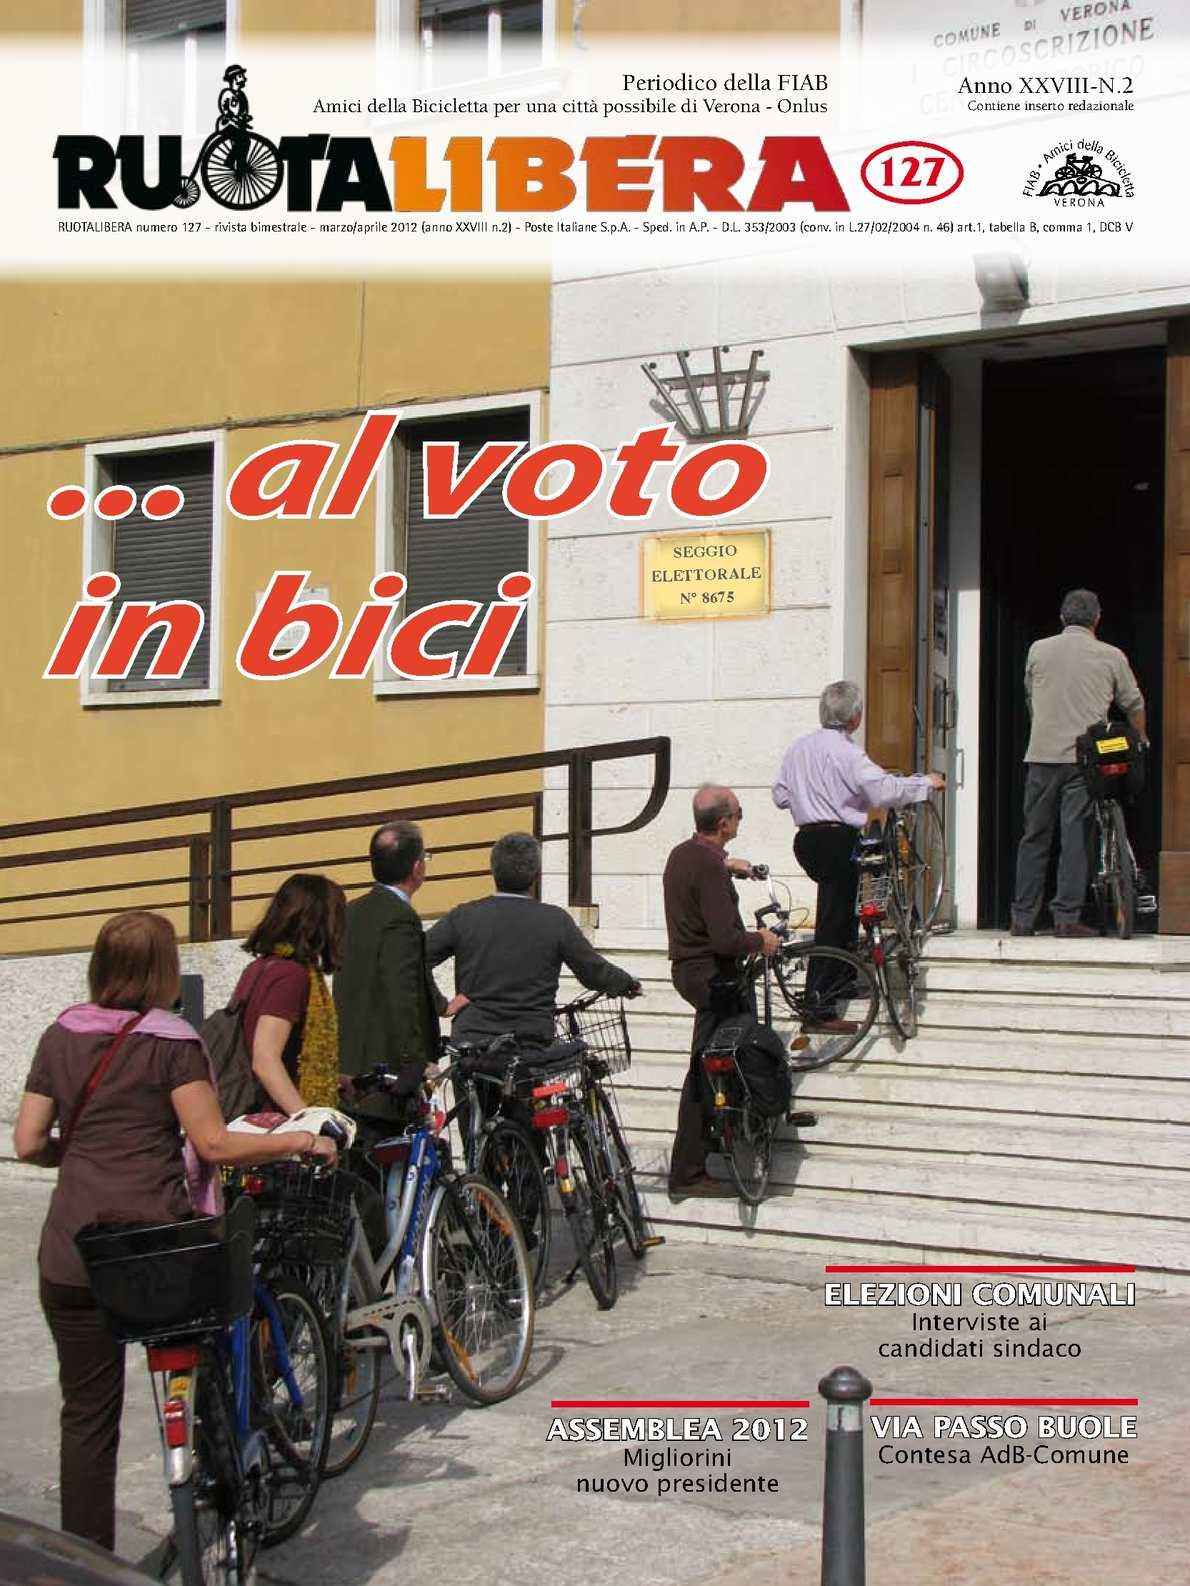 Ruotalibera 127 (marzo/aprile 2012) - FIAB AdB Verona